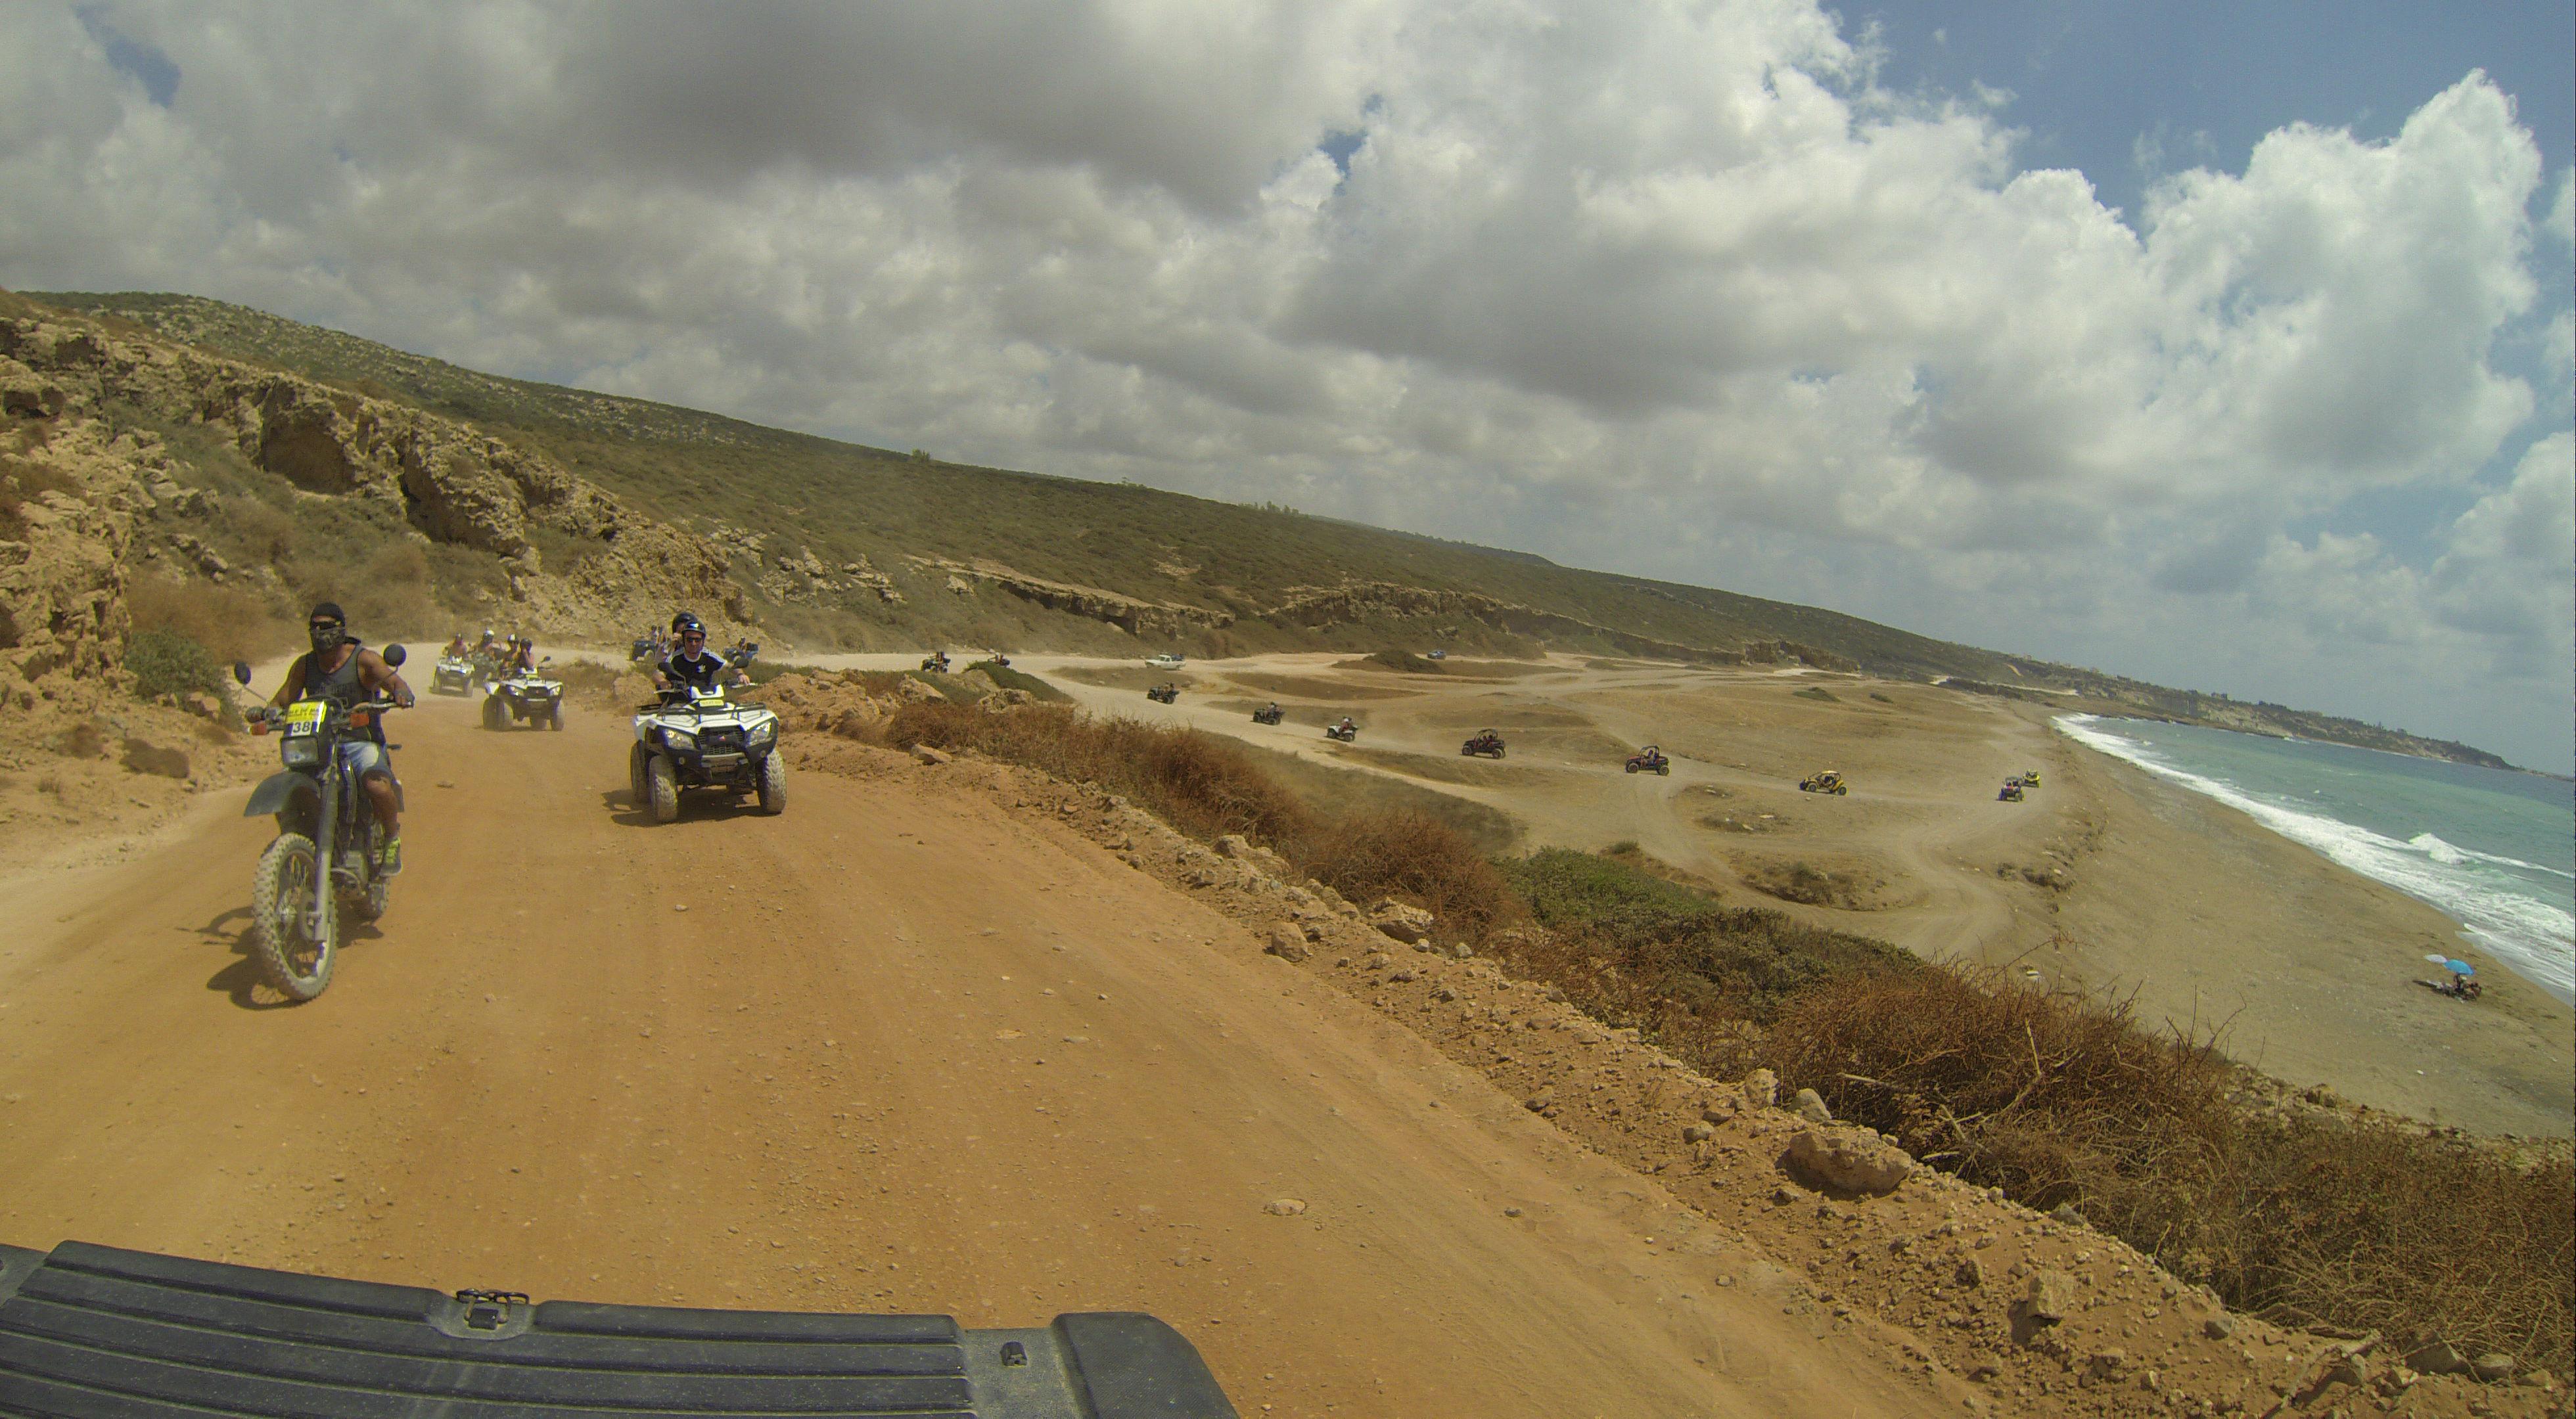 Entering Akamas and on the way to Lara Bay